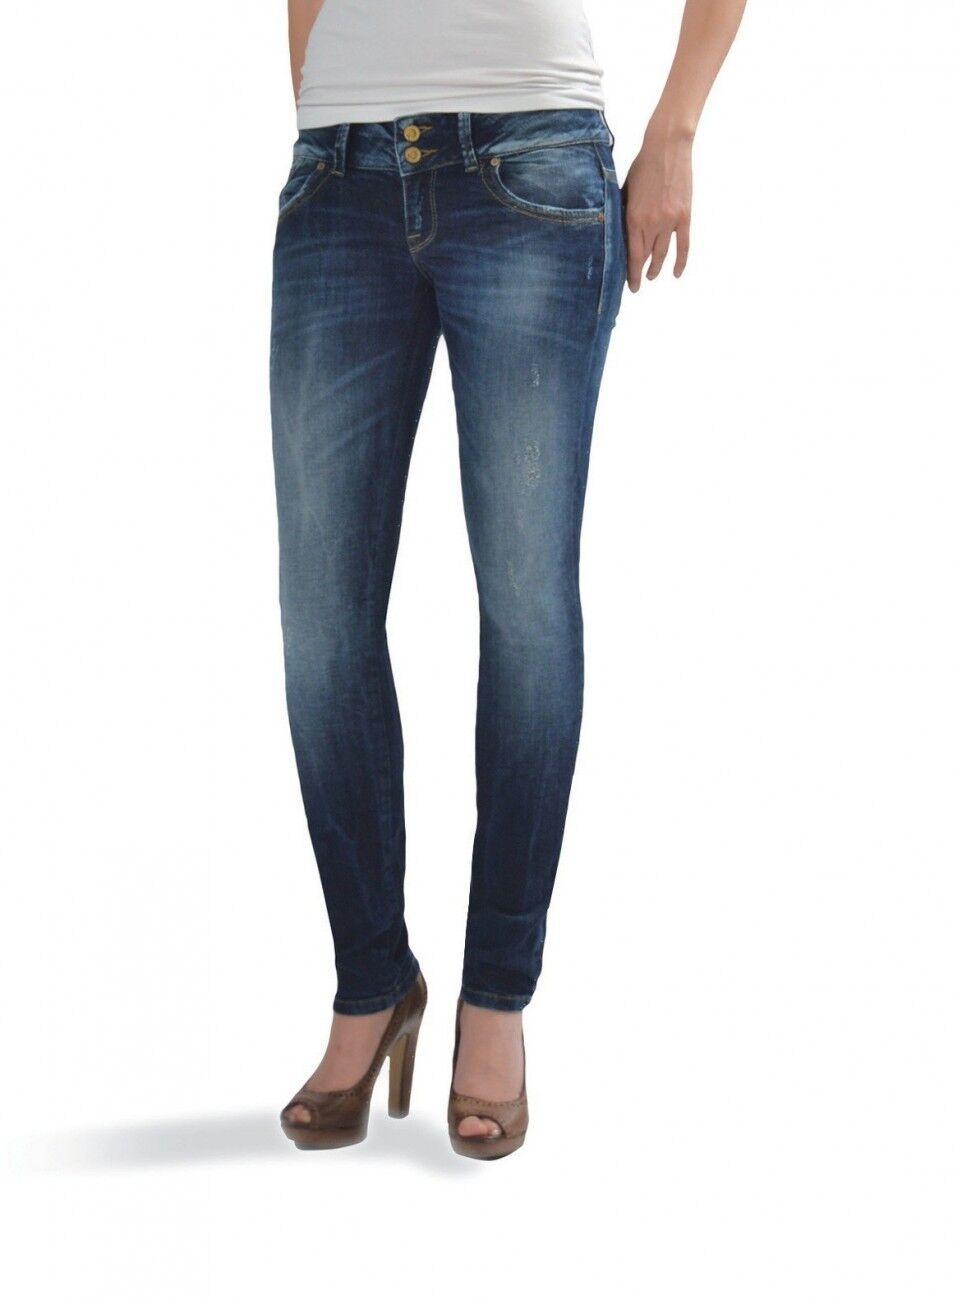 LTB Damen Jeans Molly Super Slim Oxford Wash neu